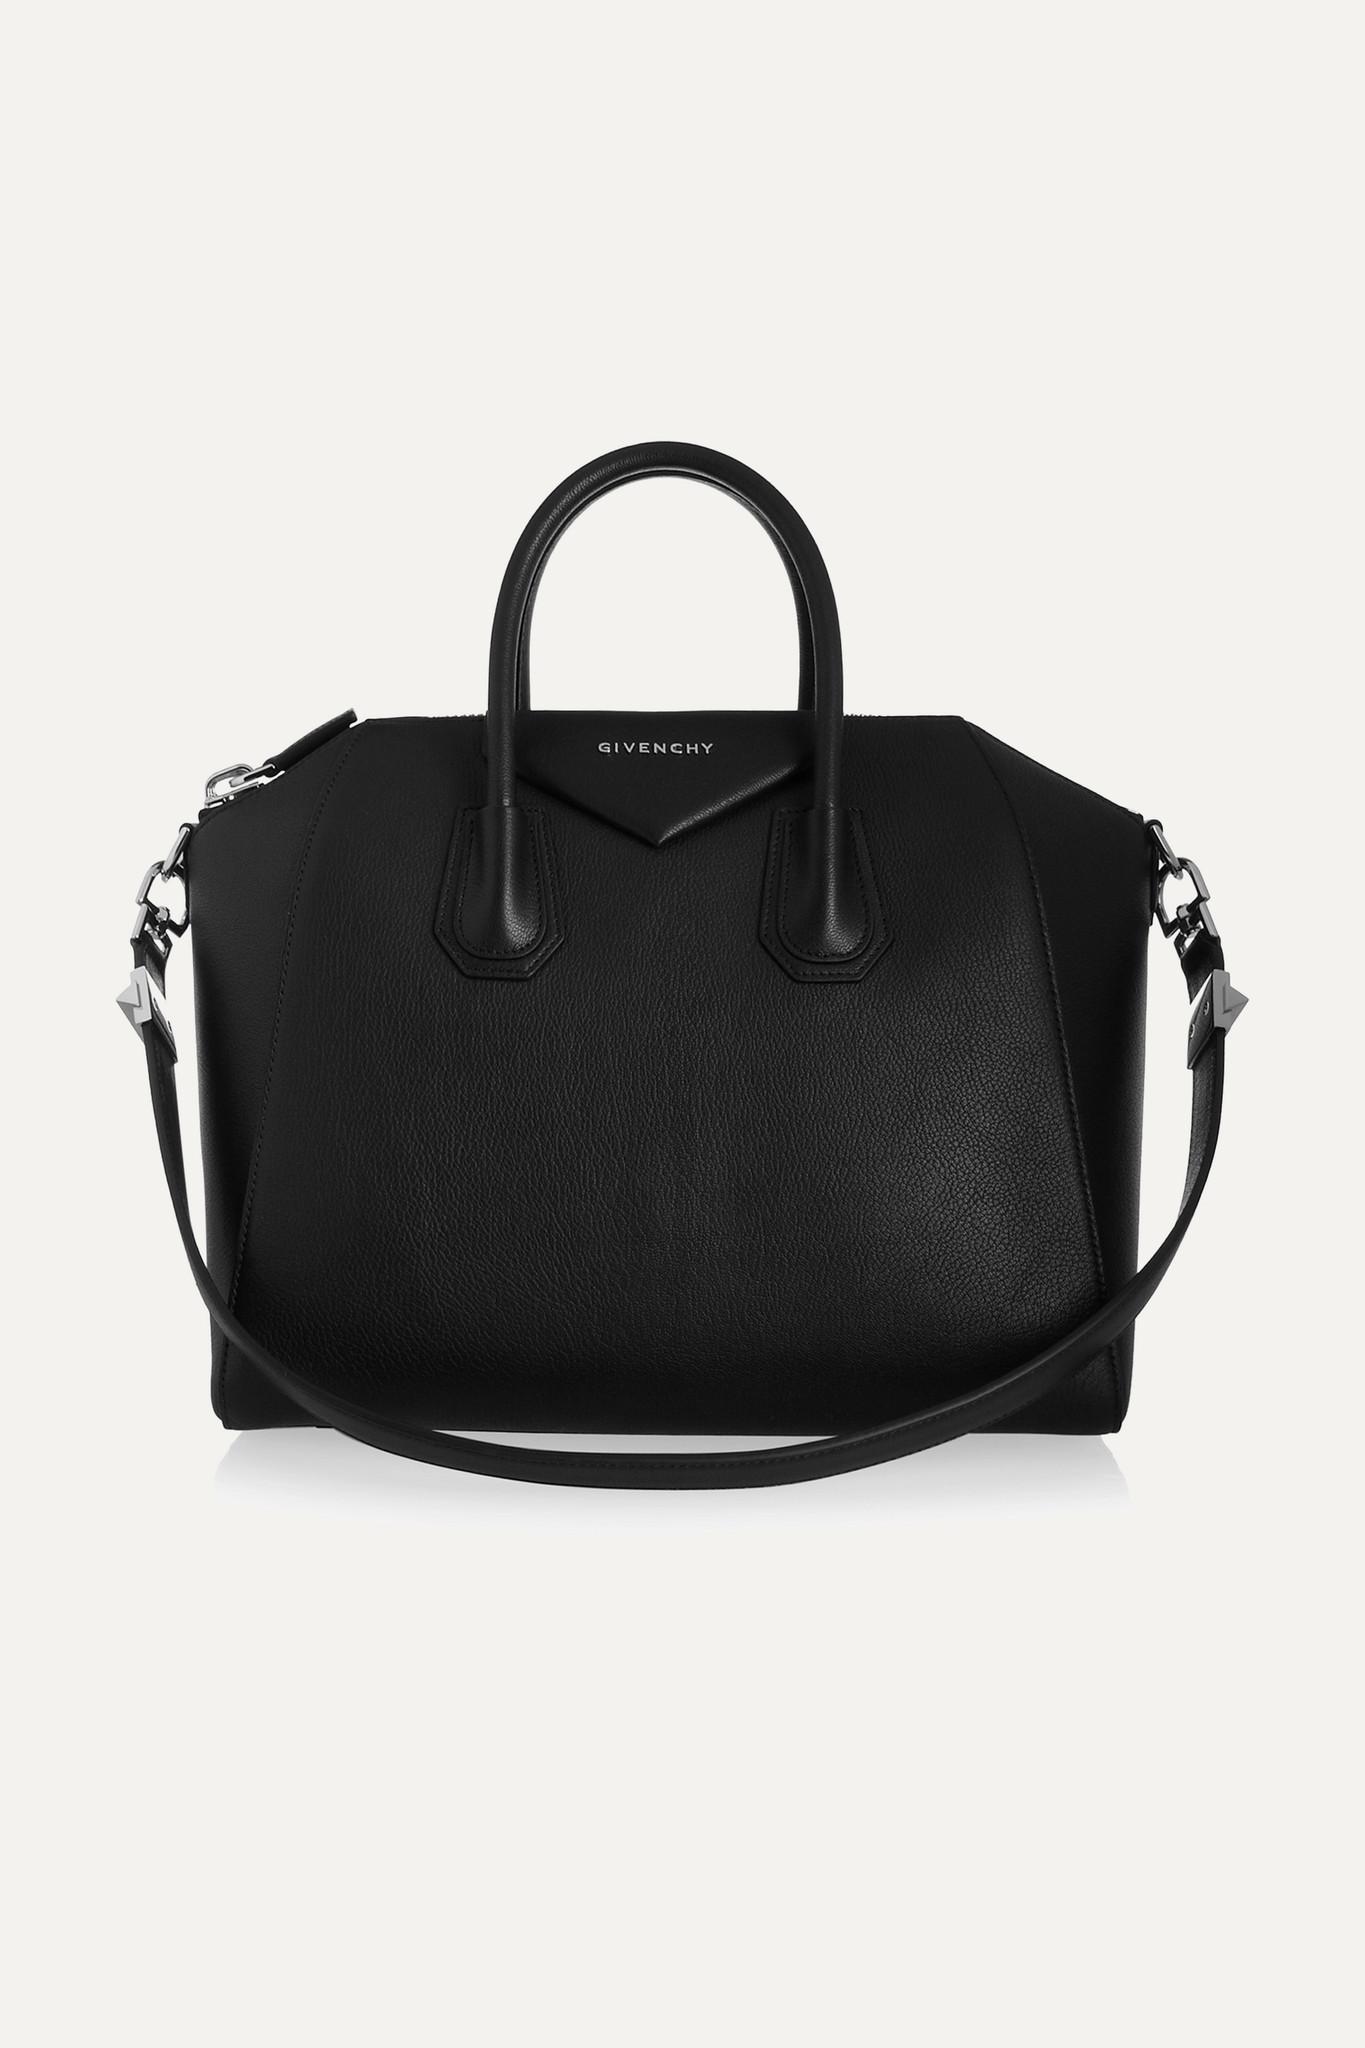 GIVENCHY - Antigona Medium Textured-leather Tote - Black - one size